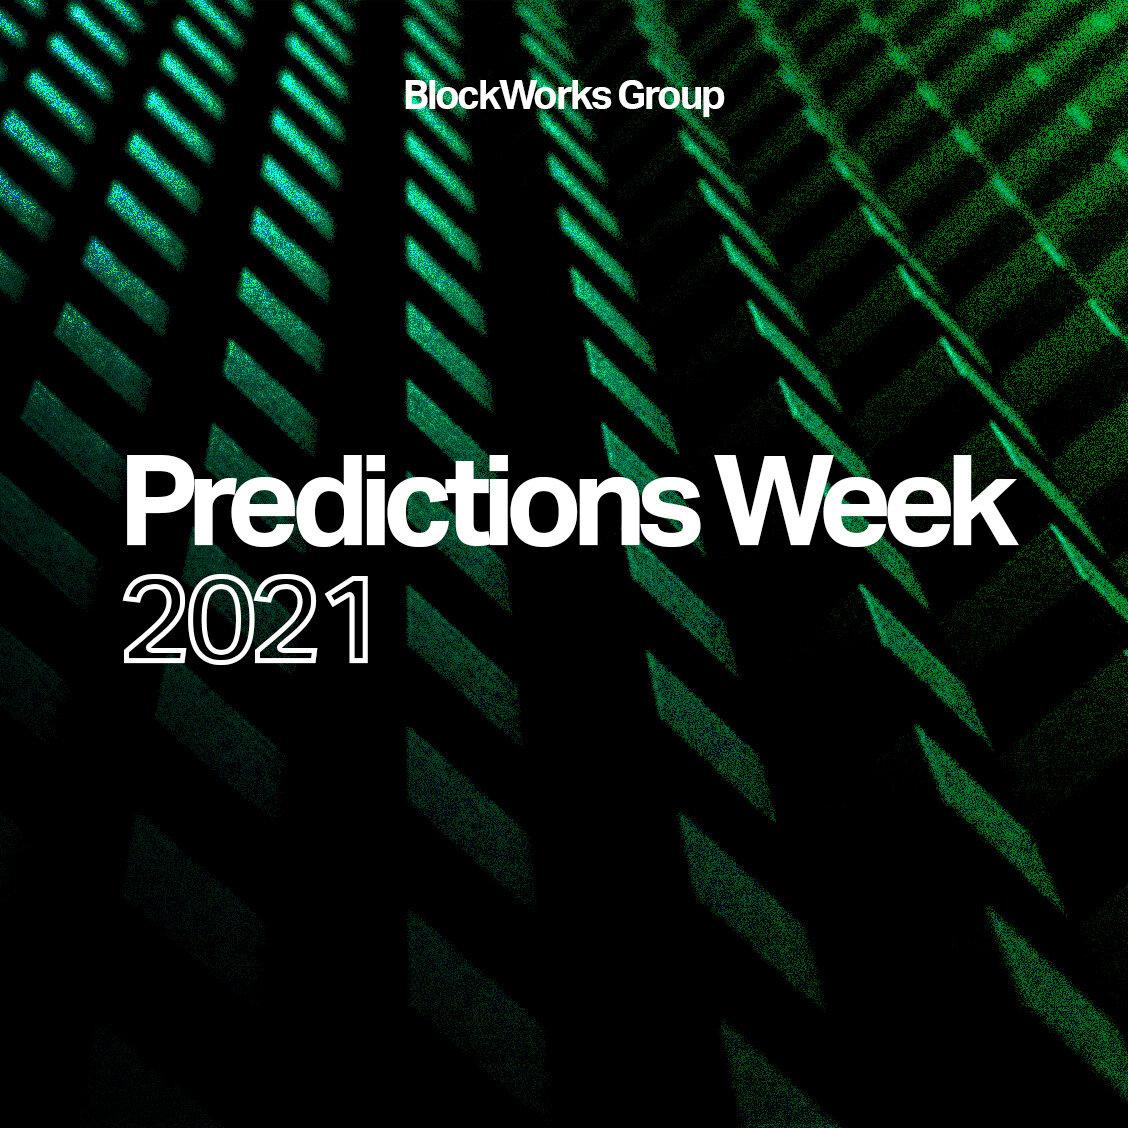 PredictionsWeek2021_Brand_Sq_20201101a.jpg